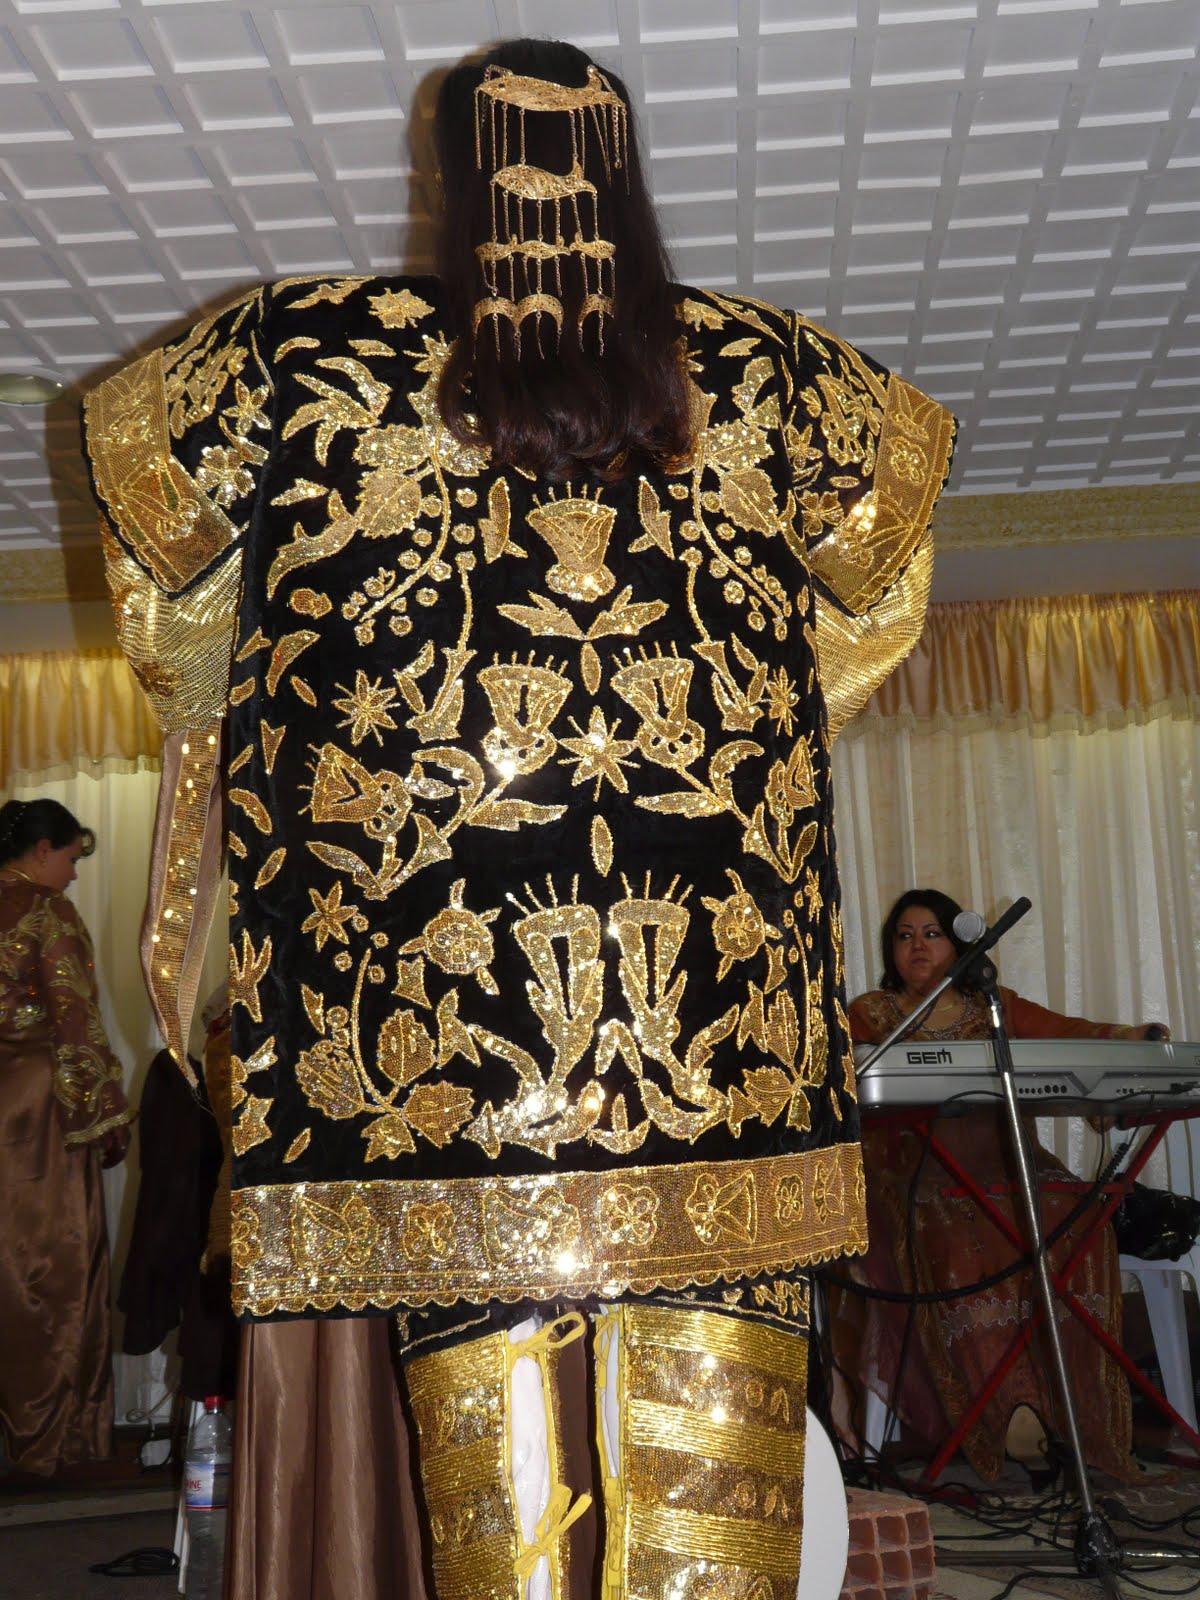 Mariage tunisien henna for Robes blanches simples pour le mariage de palais de justice